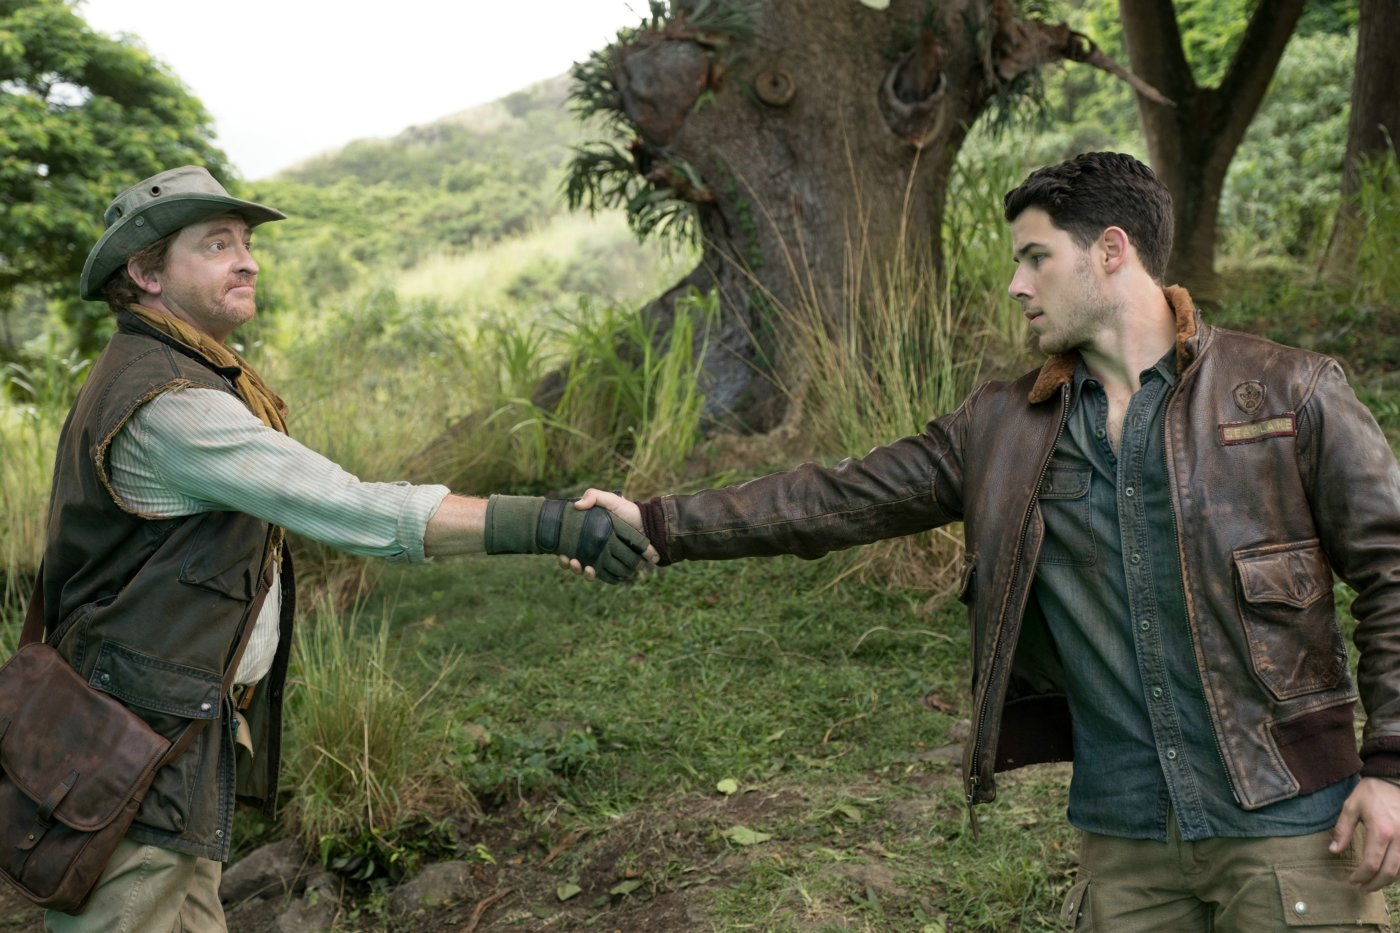 Jumanji: Welcome to The Jungle (2017) Movie Direct Download in Dual Audio ( Hindi+English) (480p,720p,1080p) Movieshub - Movies Manias